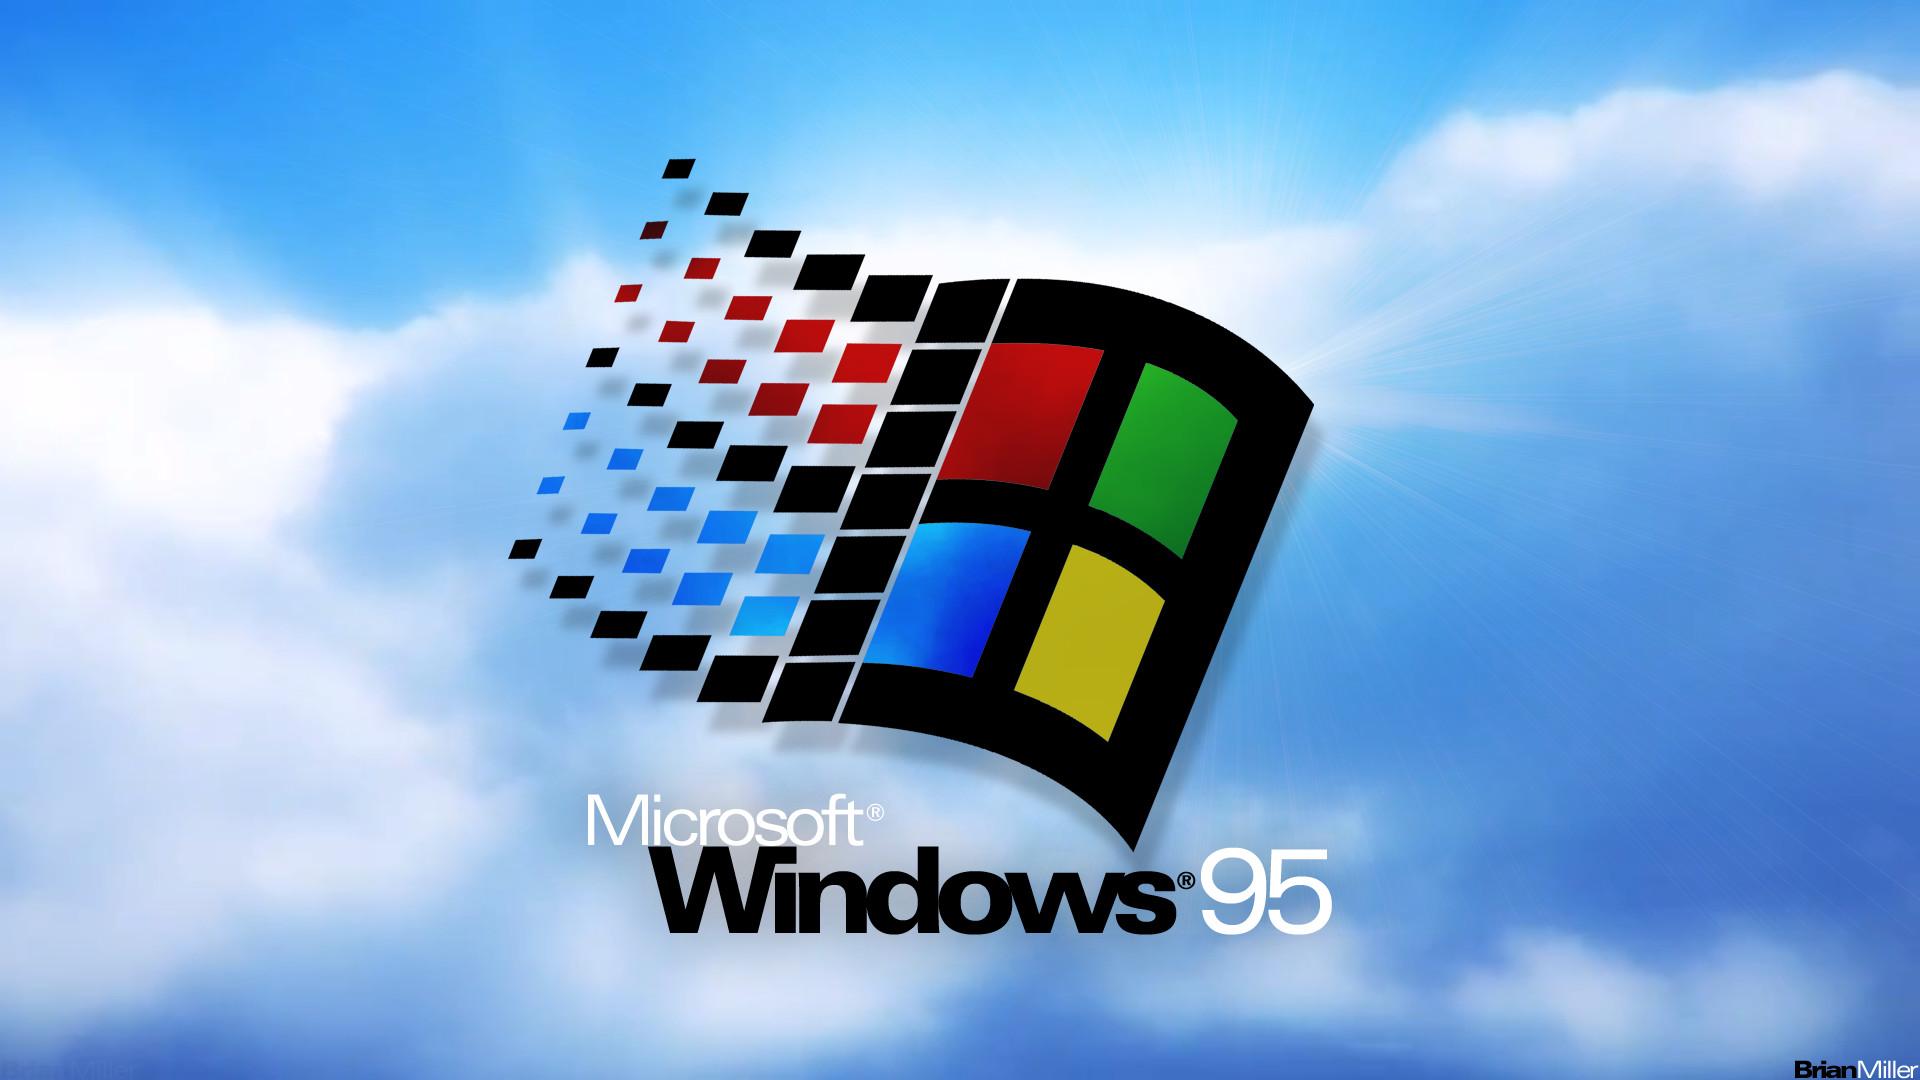 Windows 95 Resolution Windows 95 Wallpaper Hd 321130